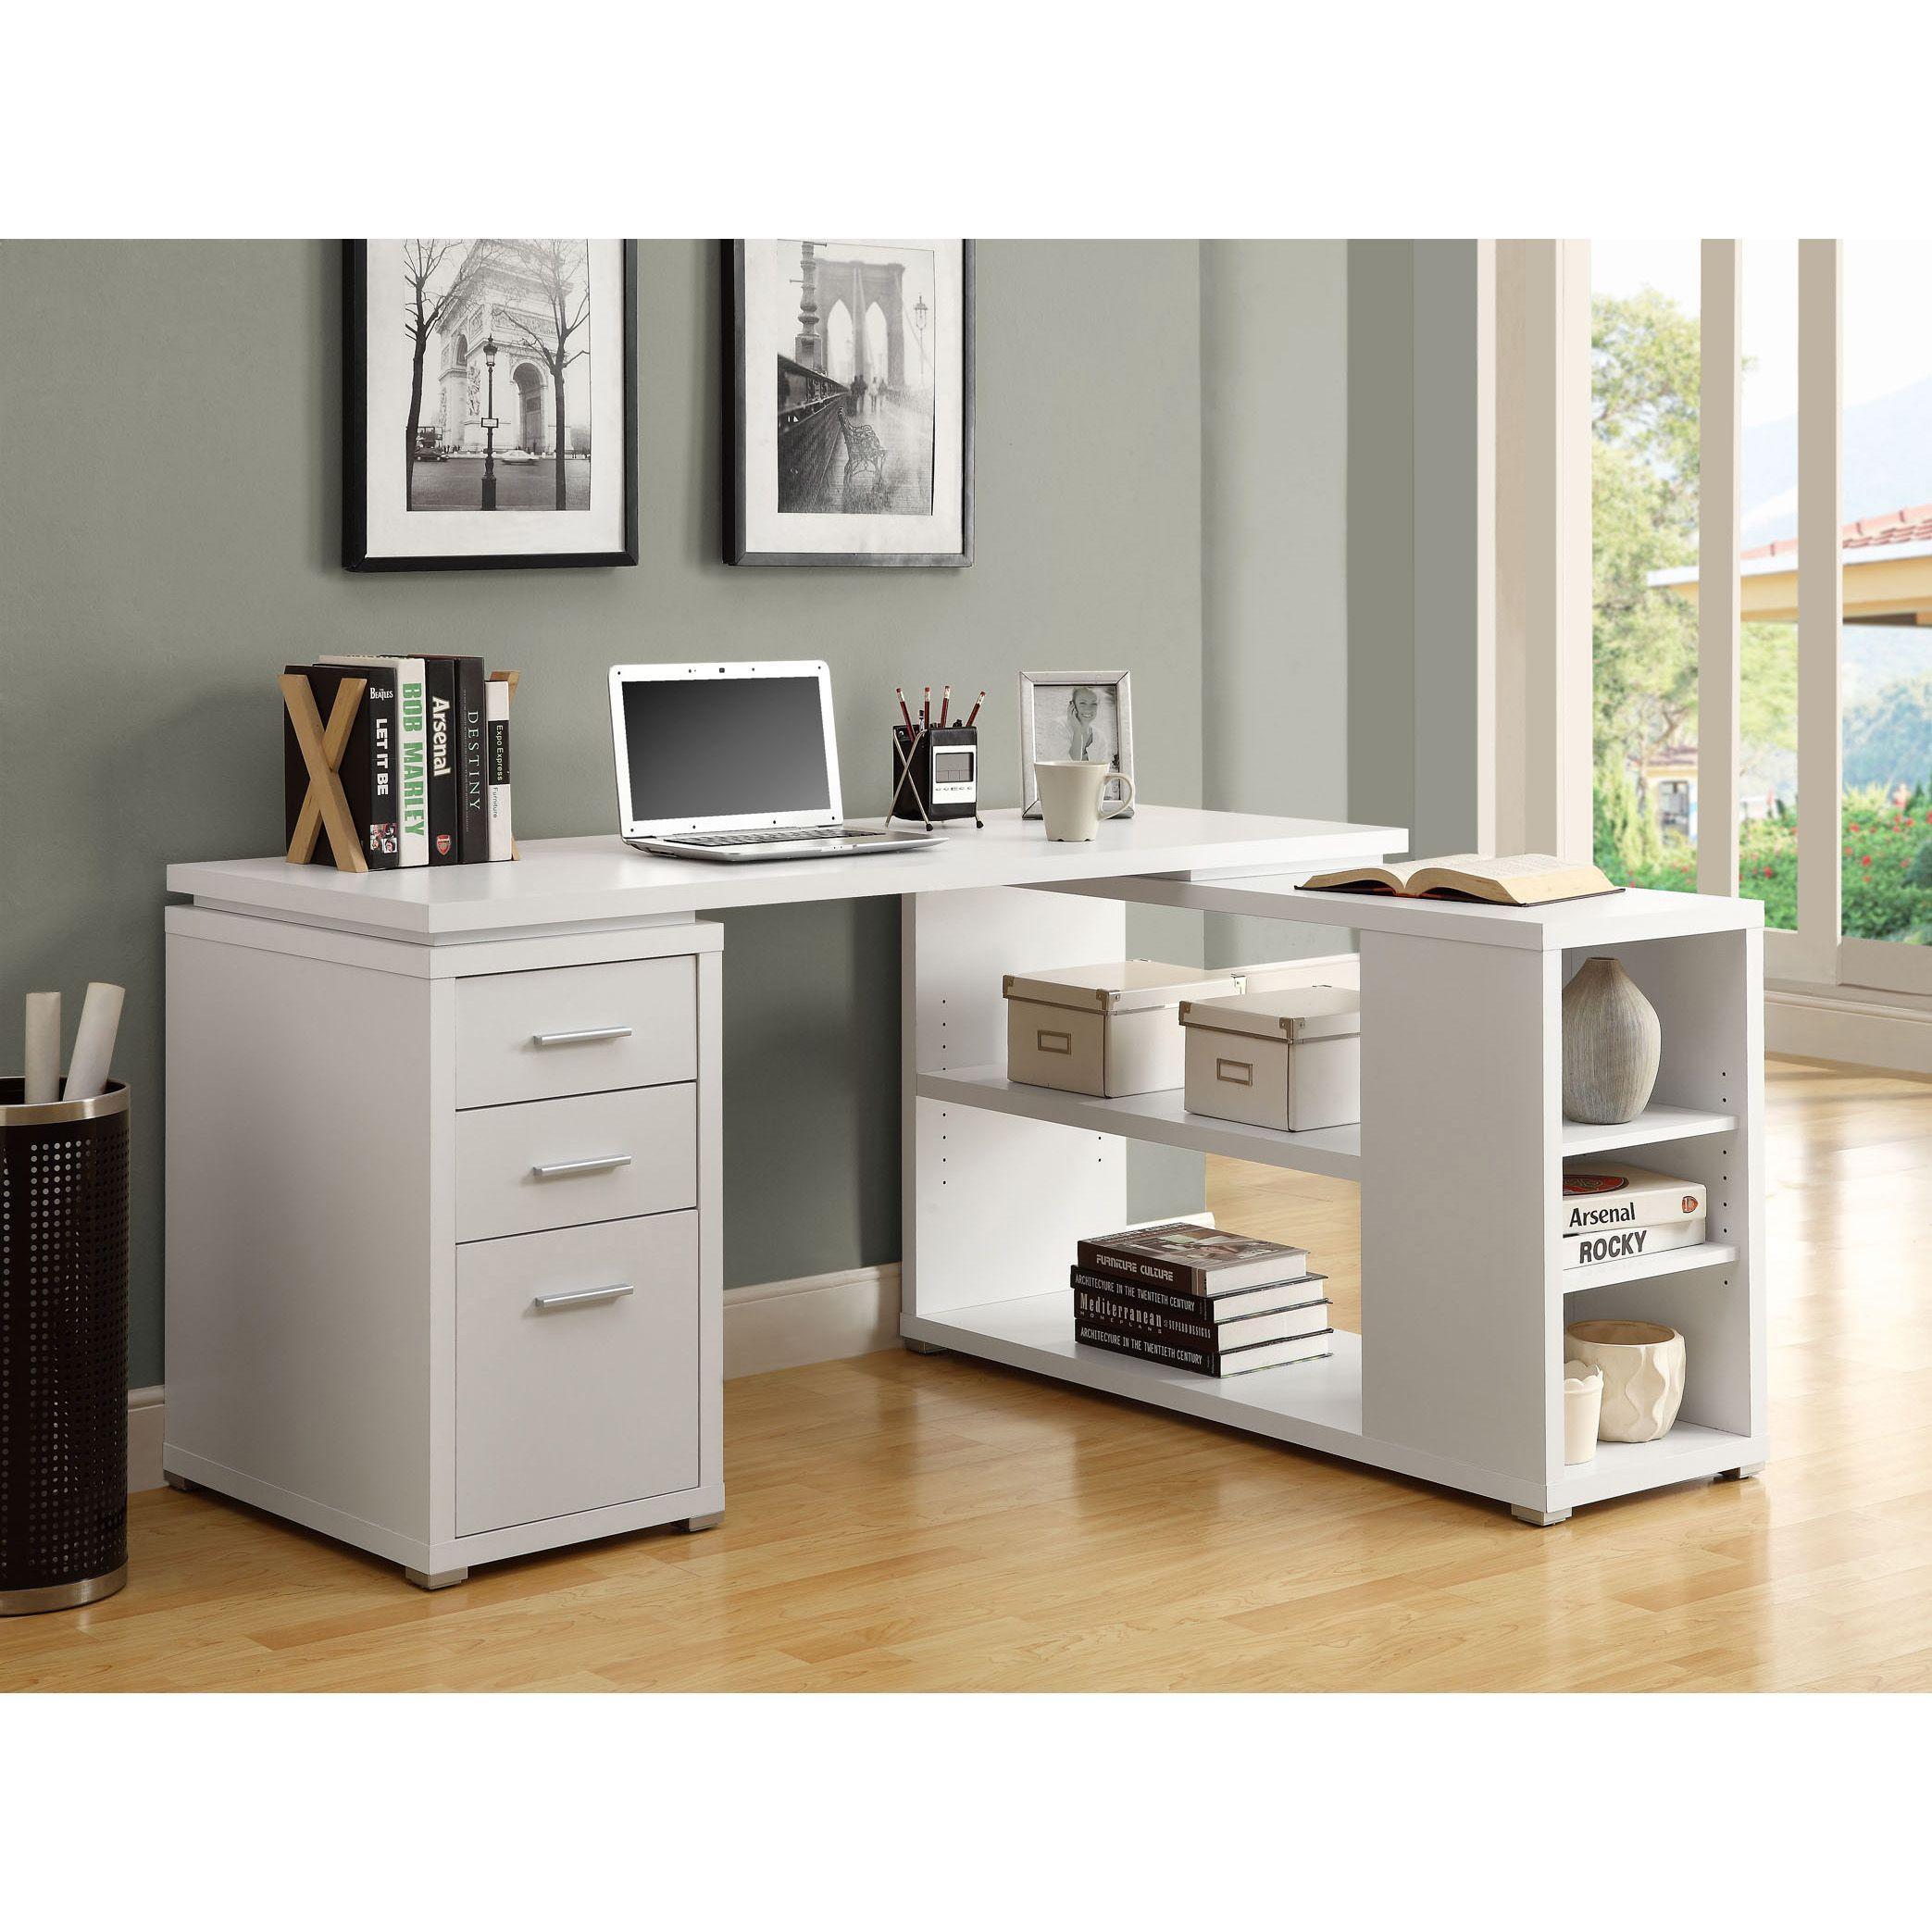 Monarch Hollow Core Left Or Right Facing Corner Desk Bureau Etagere Bureau Organisation Du Bureau Et Bureau Blanc